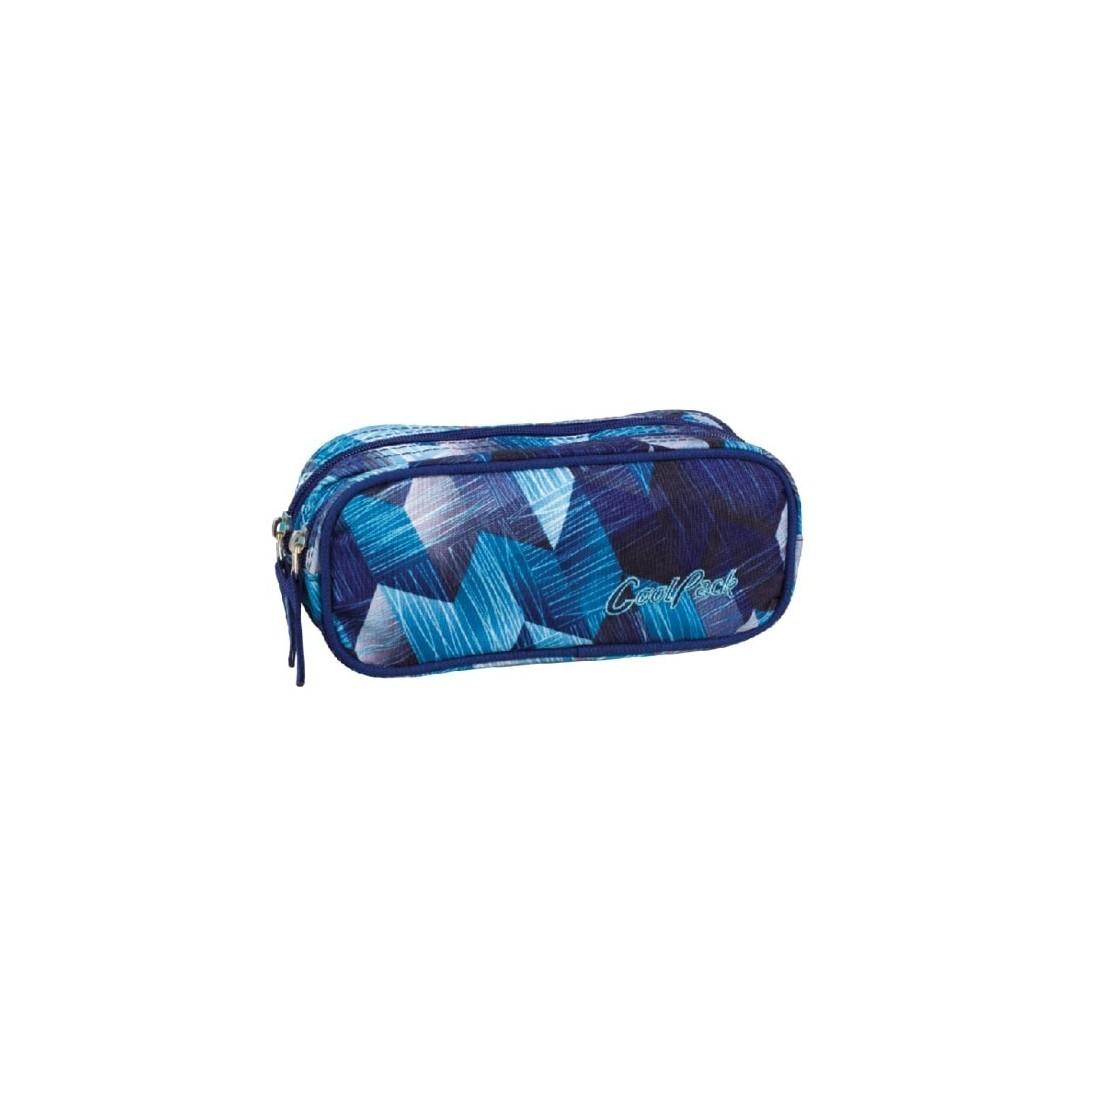 Saszetka podwójna CoolPack CLEVER FROZEN BLUE CP 640 - plecak-tornister.pl